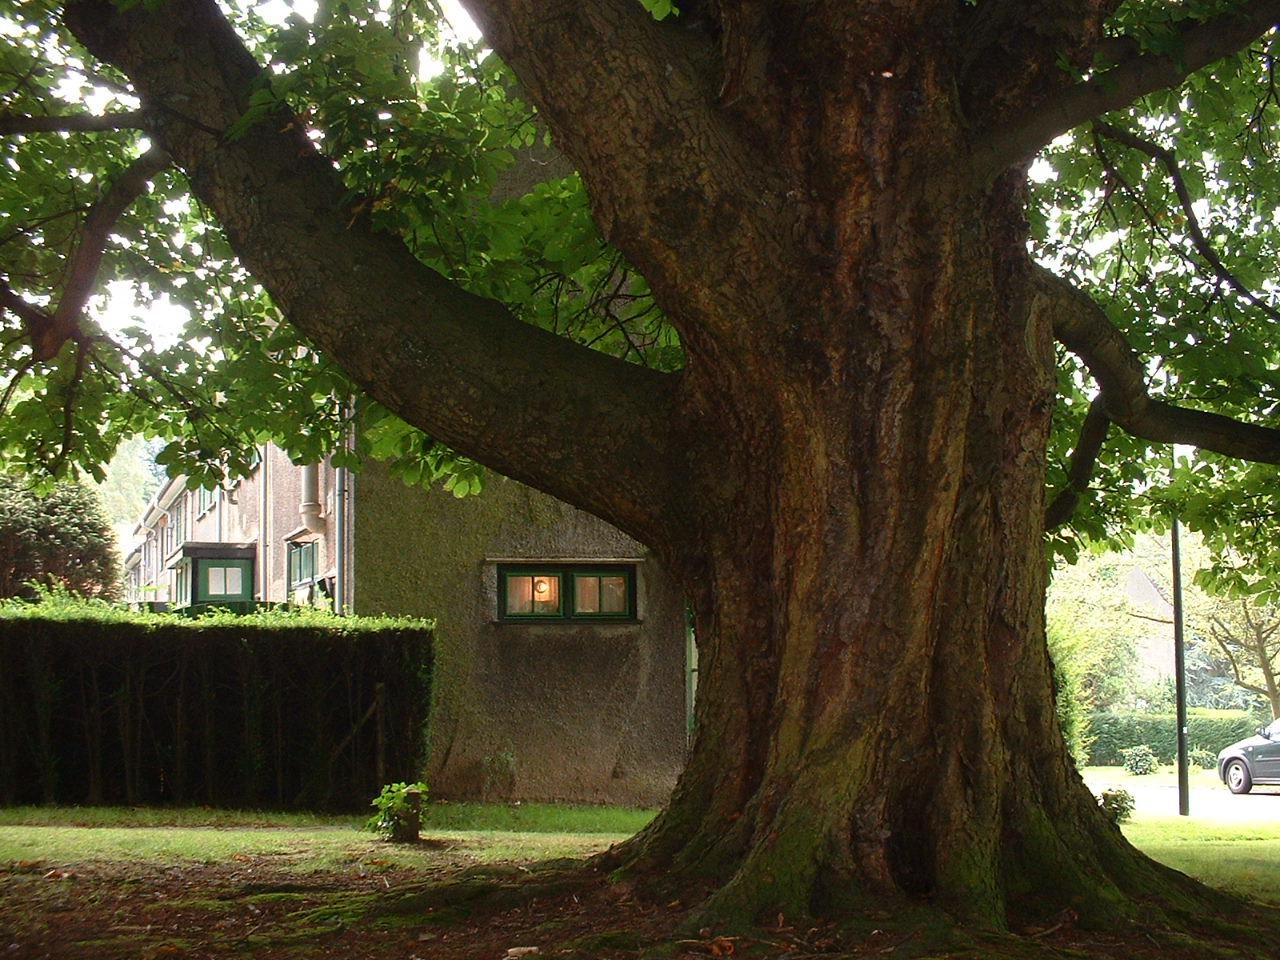 Marronnier commun – Watermael-Boitsfort, Rue des Ibis –  25 Juillet 2002